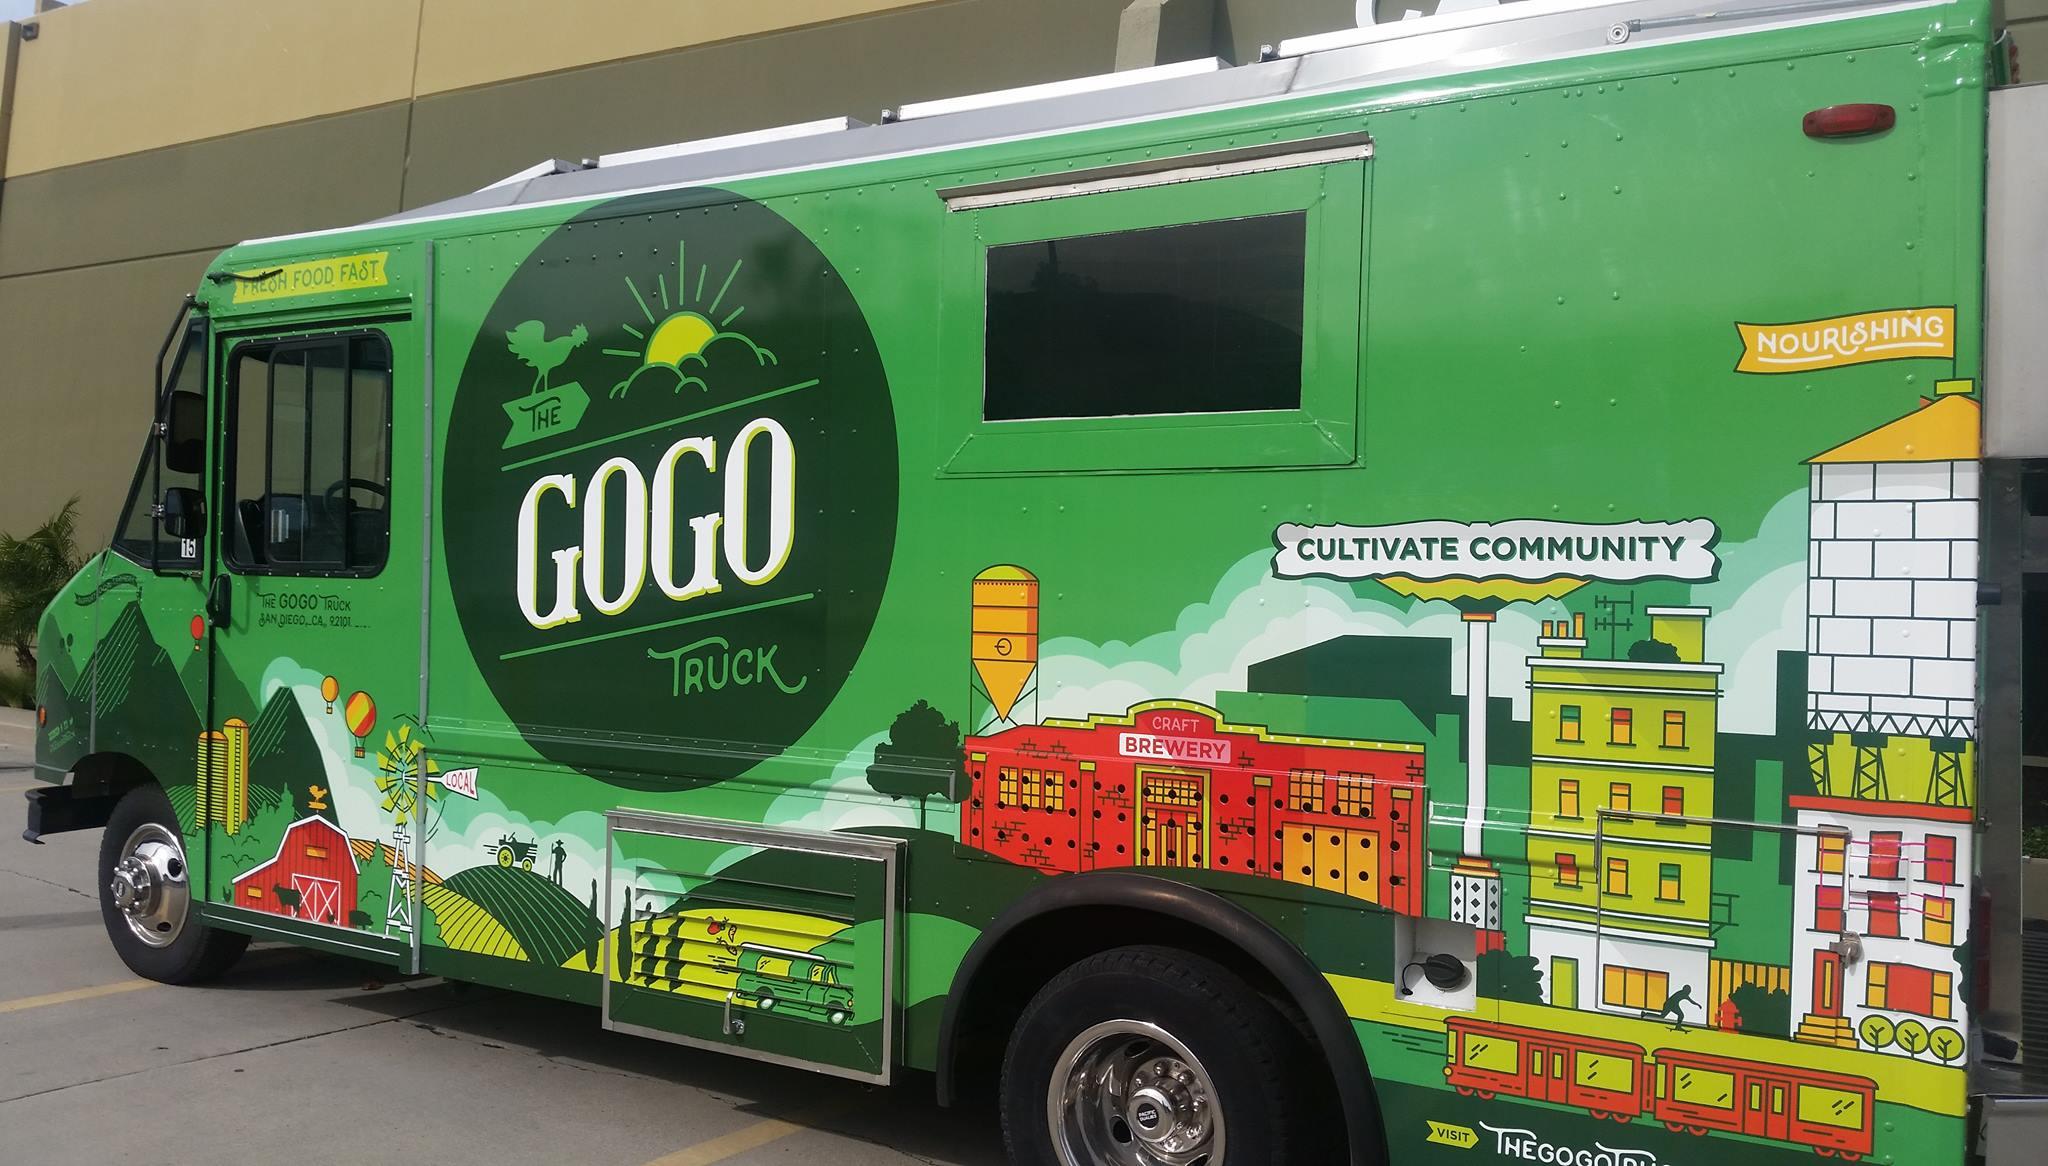 The Go Go Truck